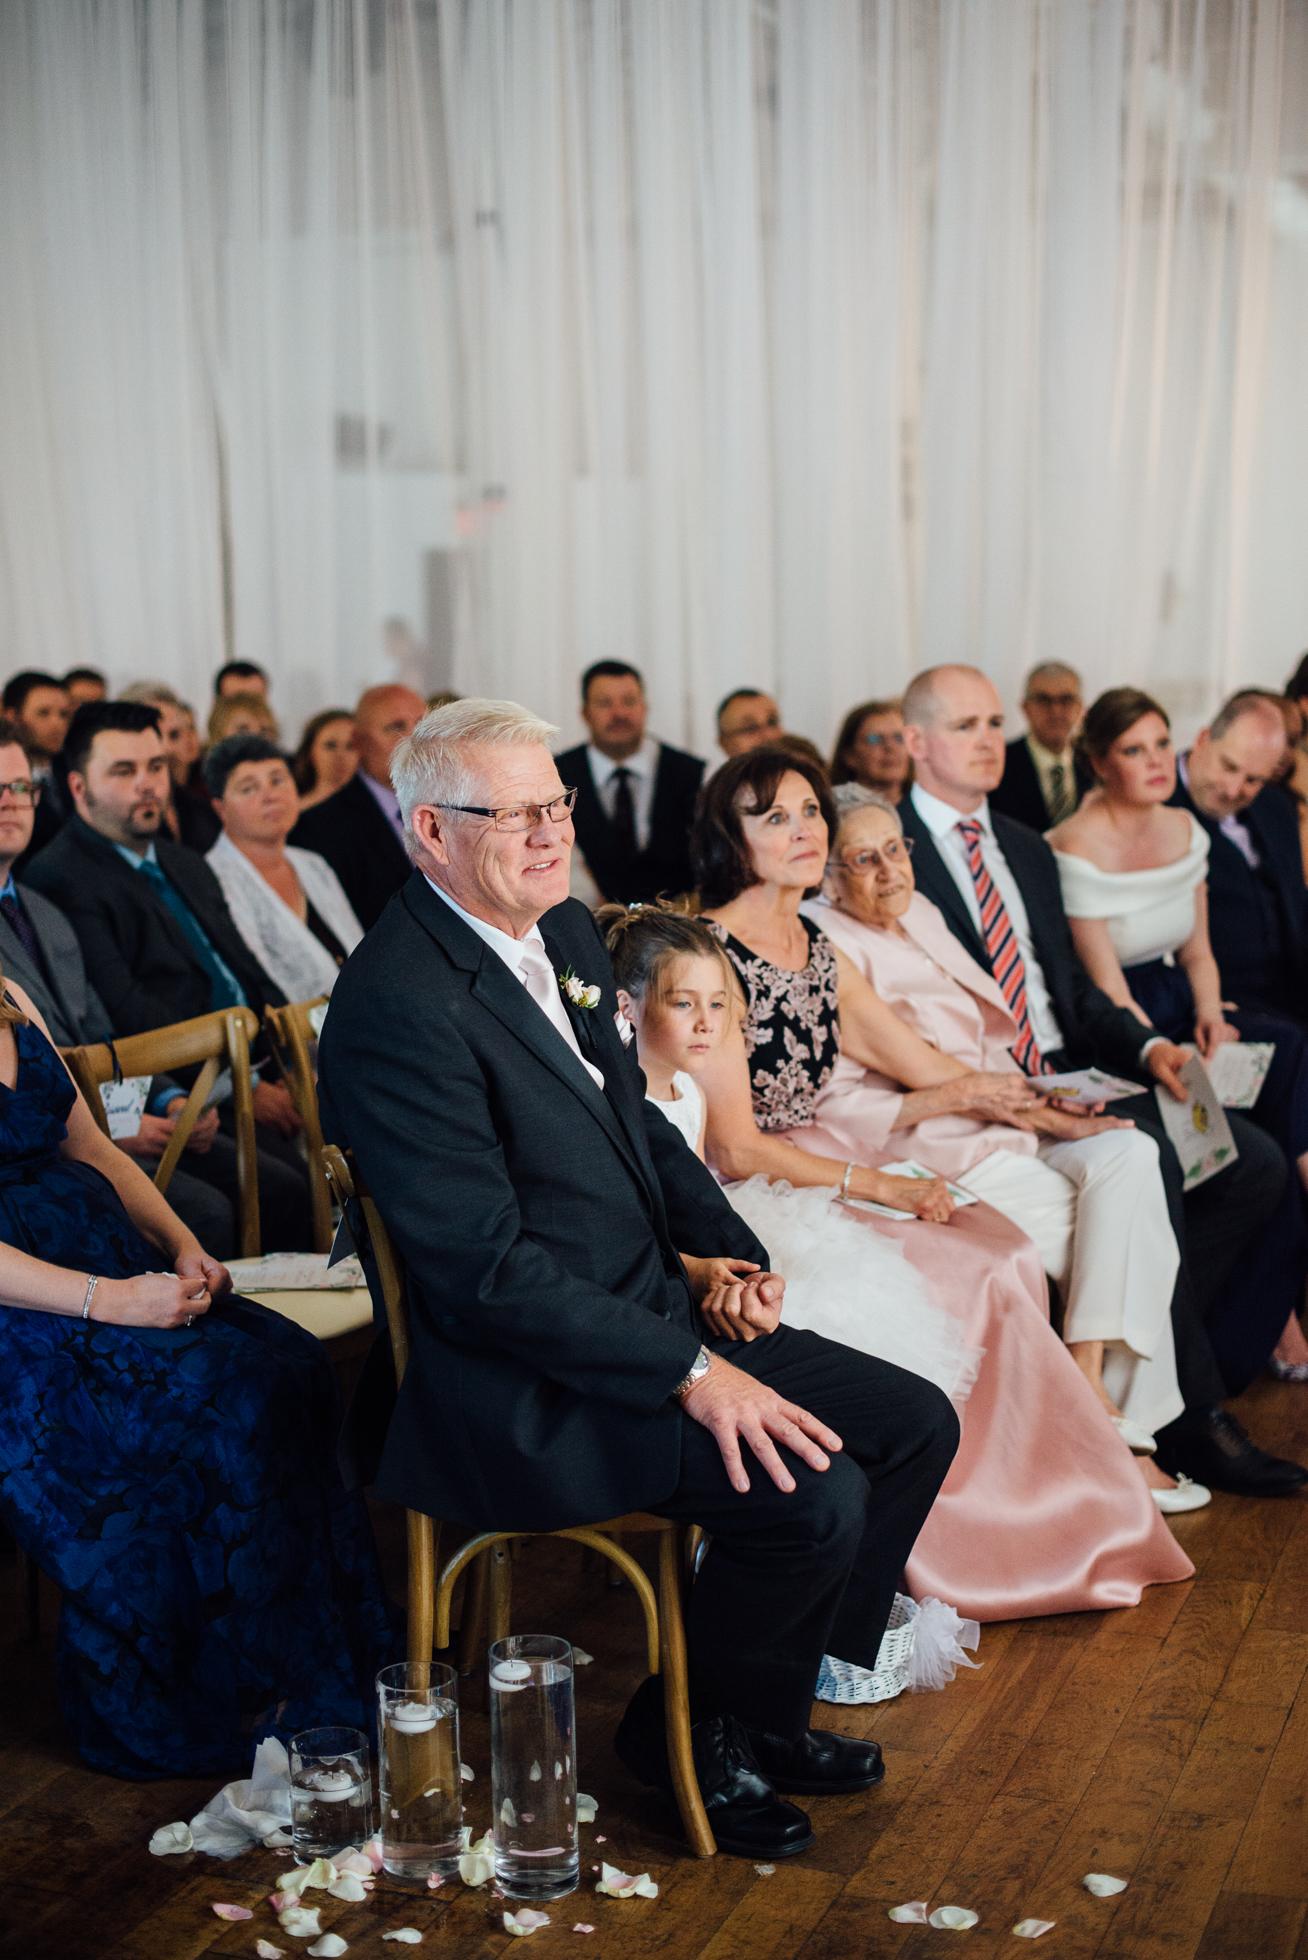 99-Sudbury-Toronto-Wedding-Photography-17.jpg